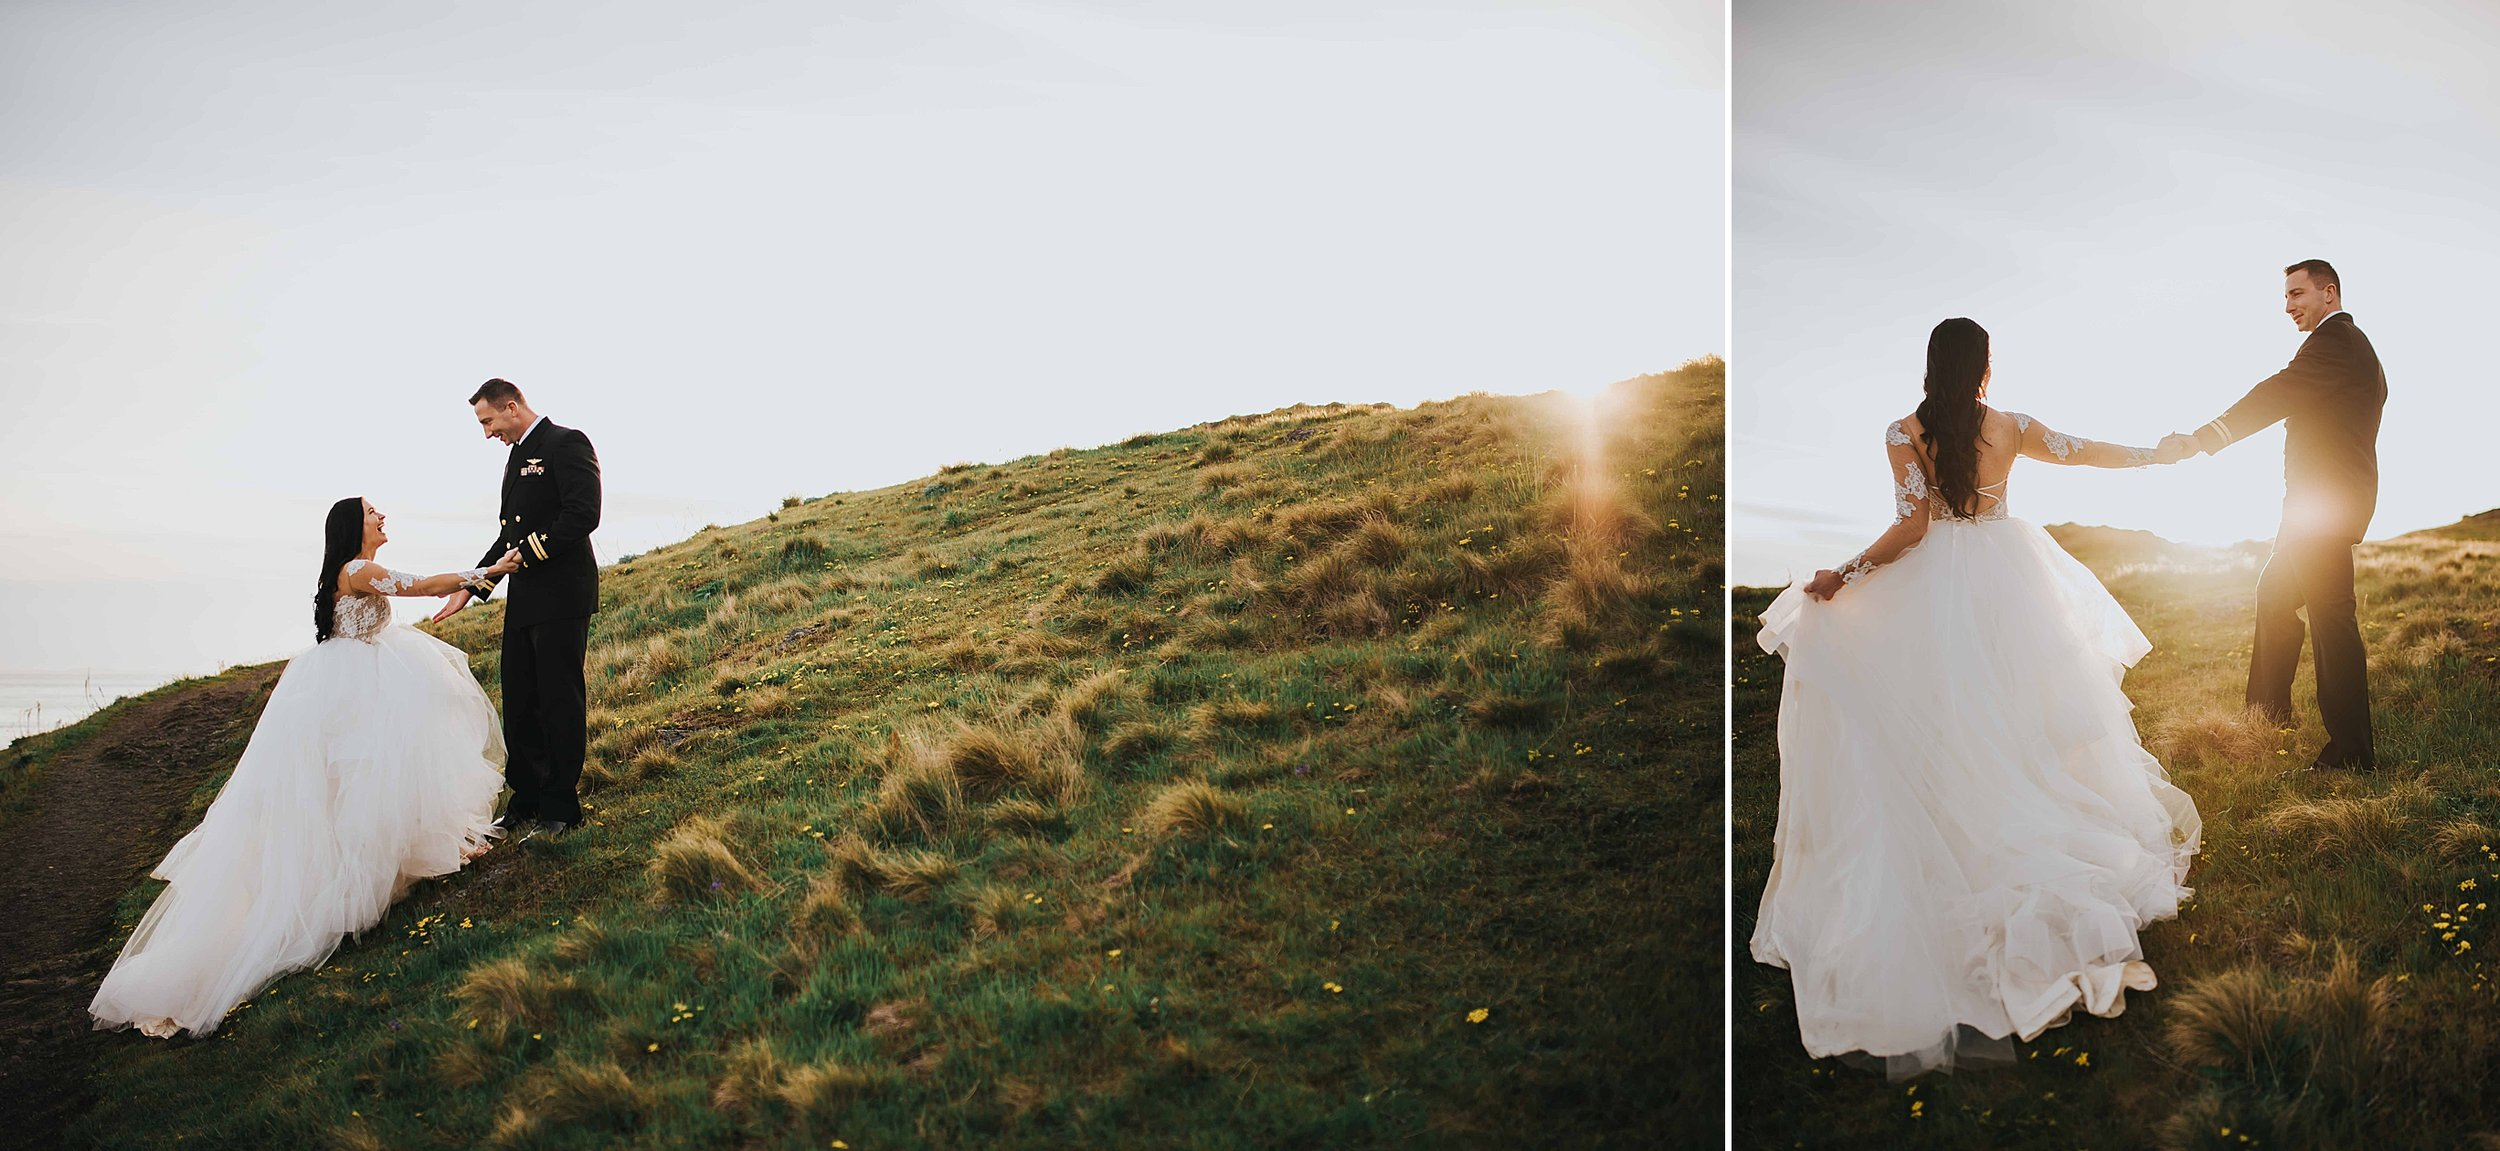 KC-Wedding-photographer-J HODGES PHOTOGRAPHY_0260.jpg